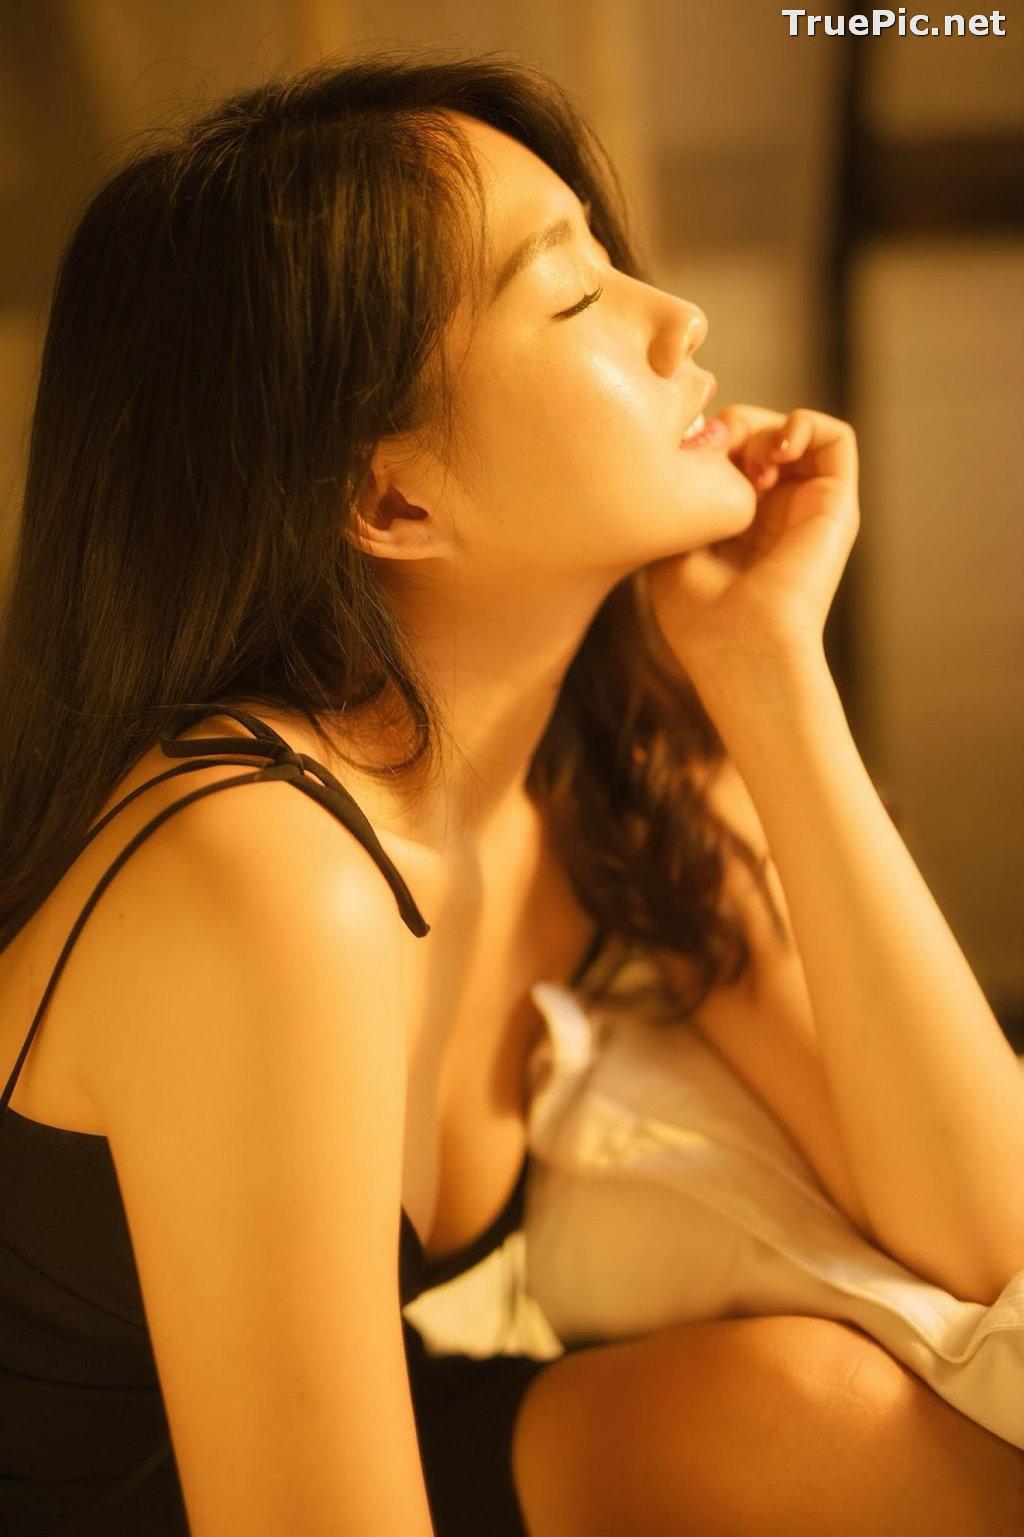 Image Vietnamese Hot Girl - Nguyen Hoang Kieu Trinh - My Black Angel - TruePic.net - Picture-34